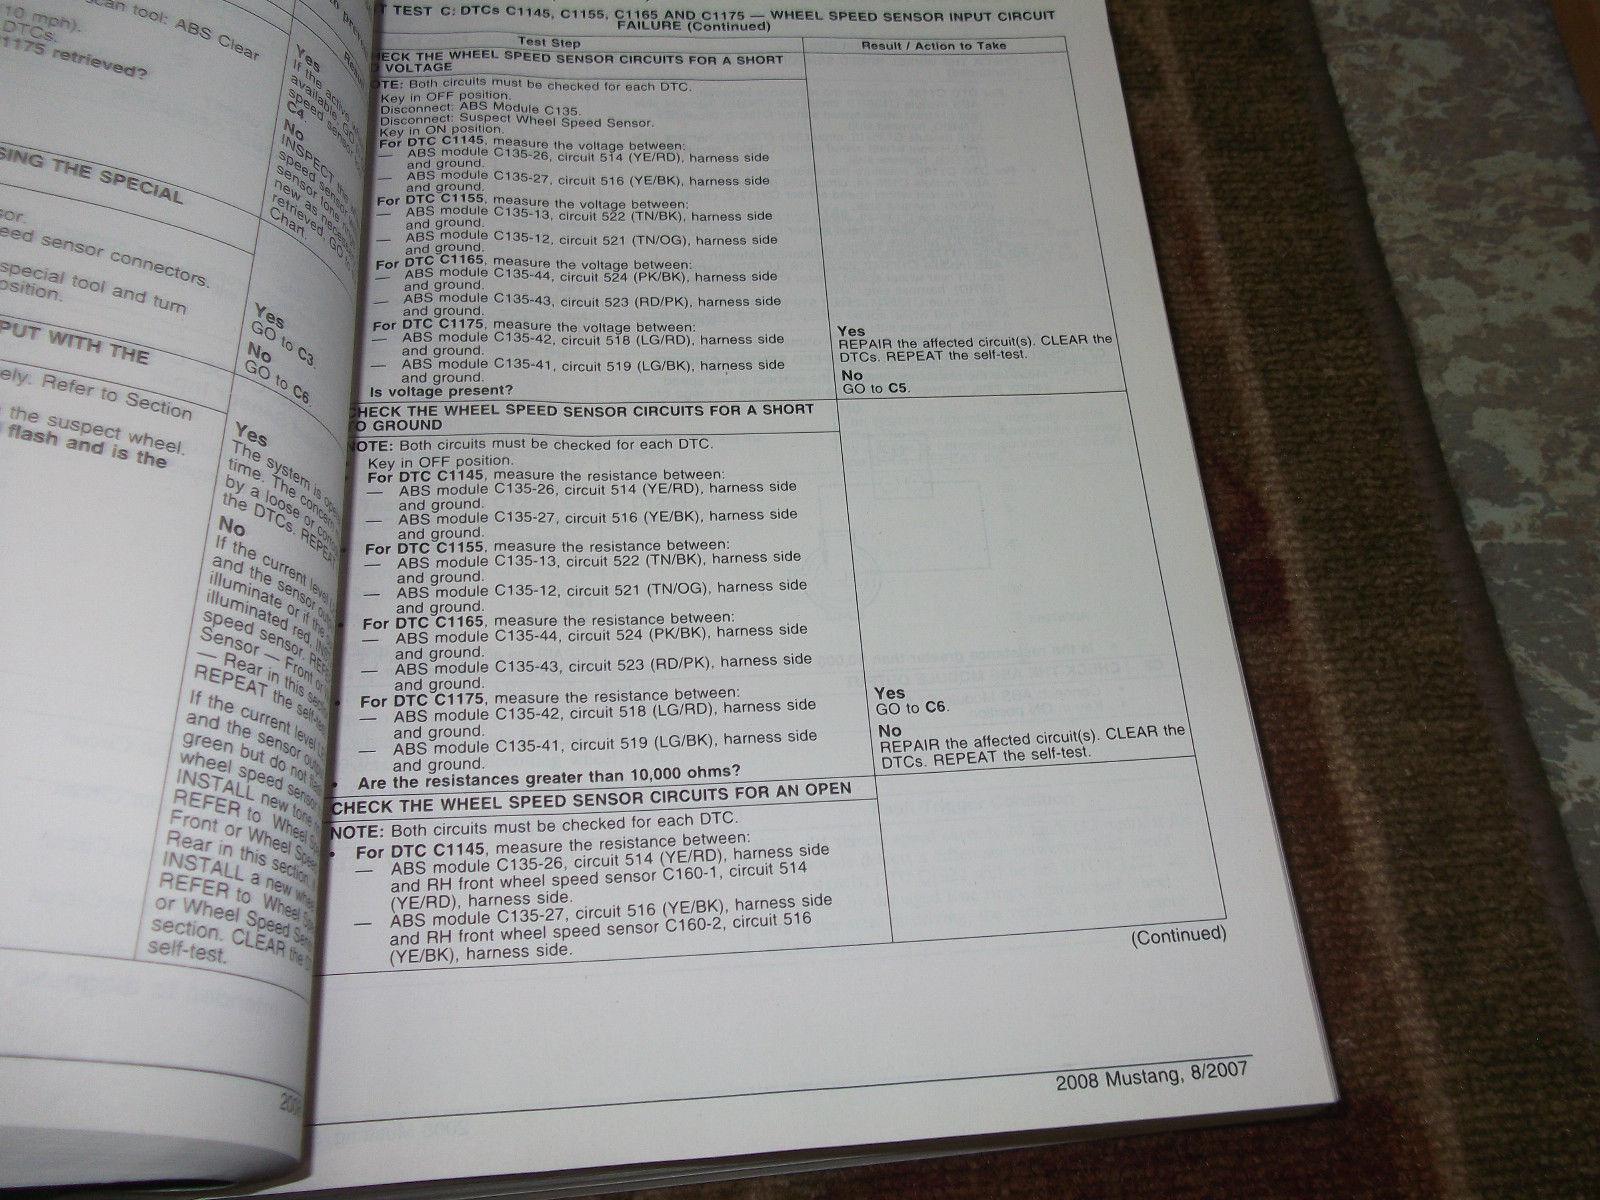 2008 ford mustang gt cobra mach service shop repair manual. Black Bedroom Furniture Sets. Home Design Ideas